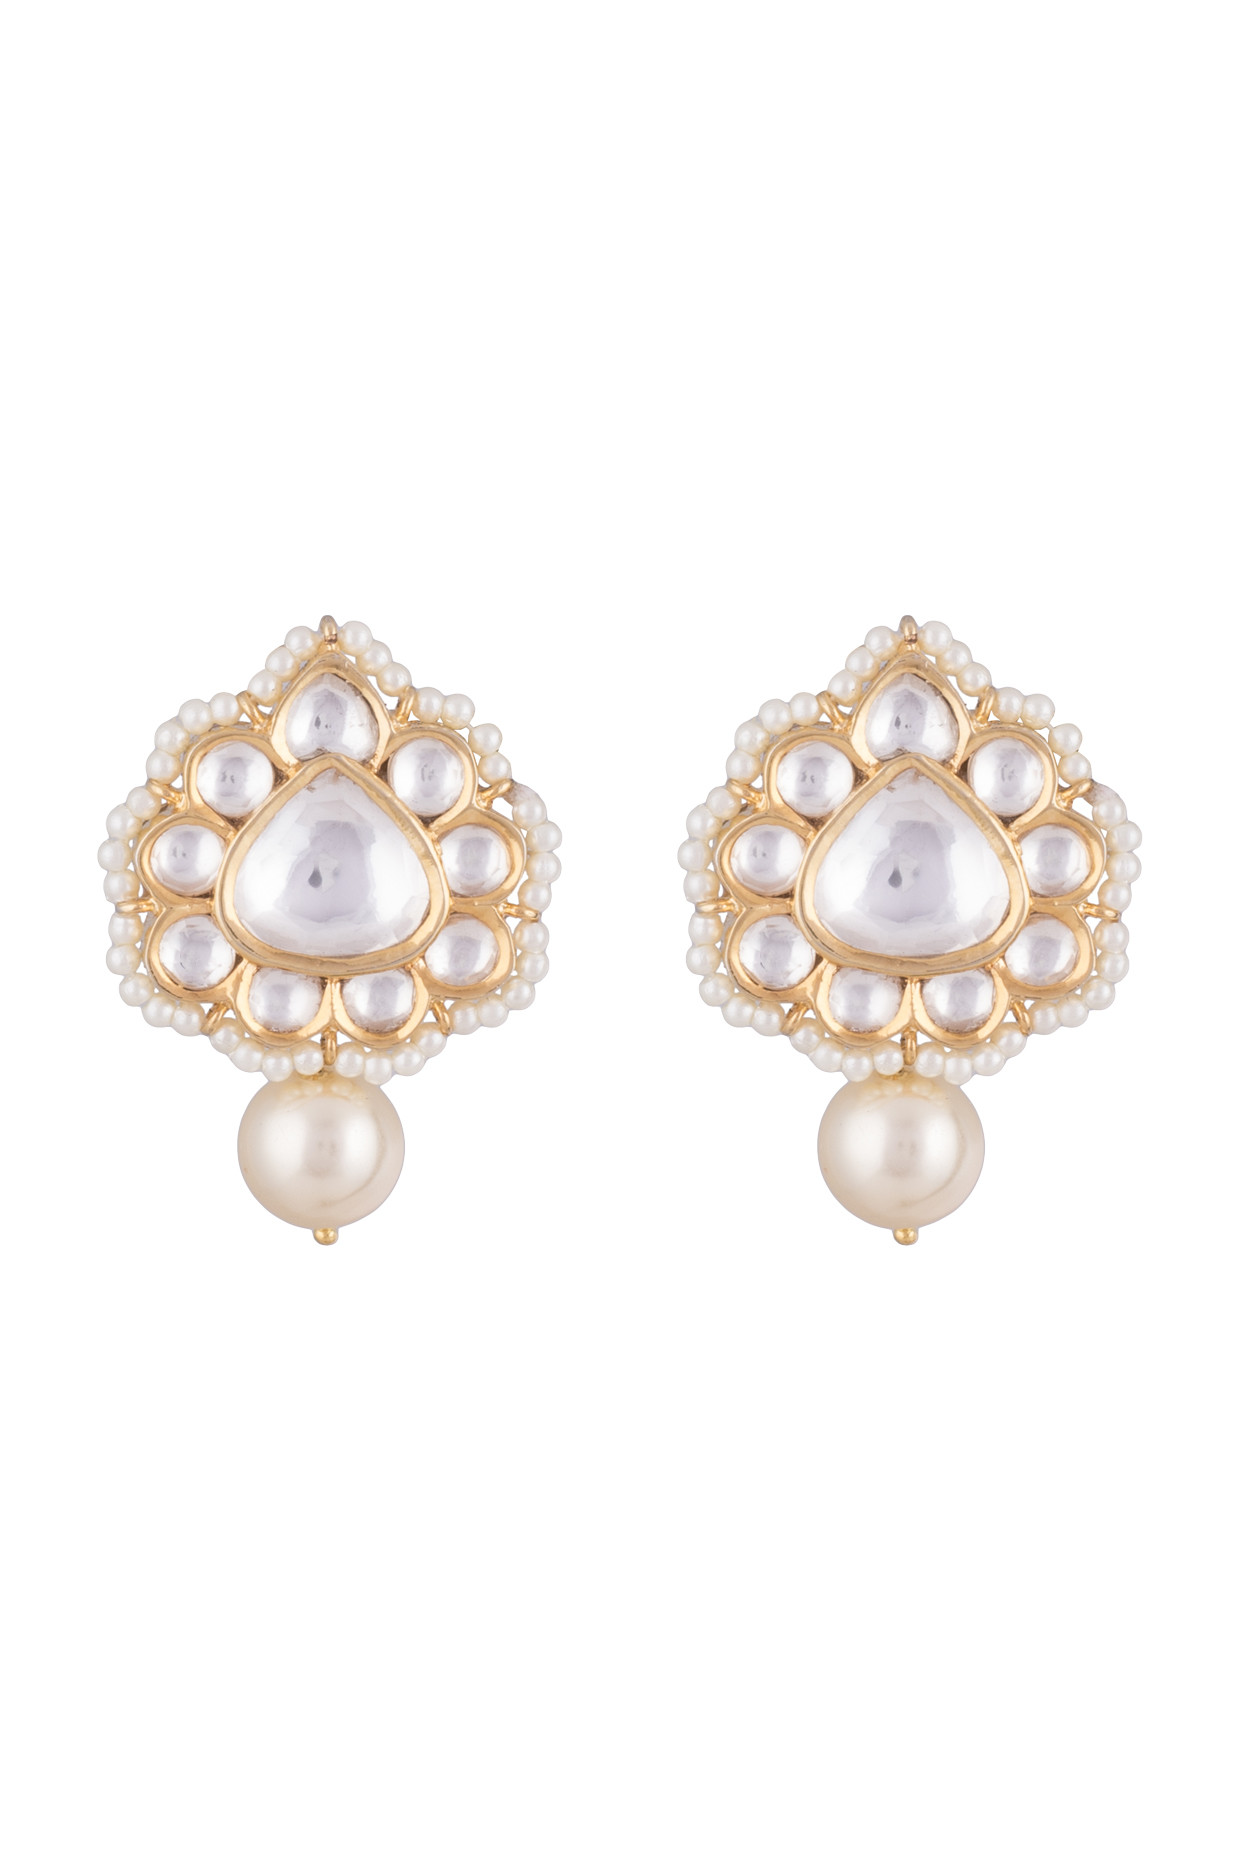 Gold Finish Faux Kundan & Pearls Earrings by Aster